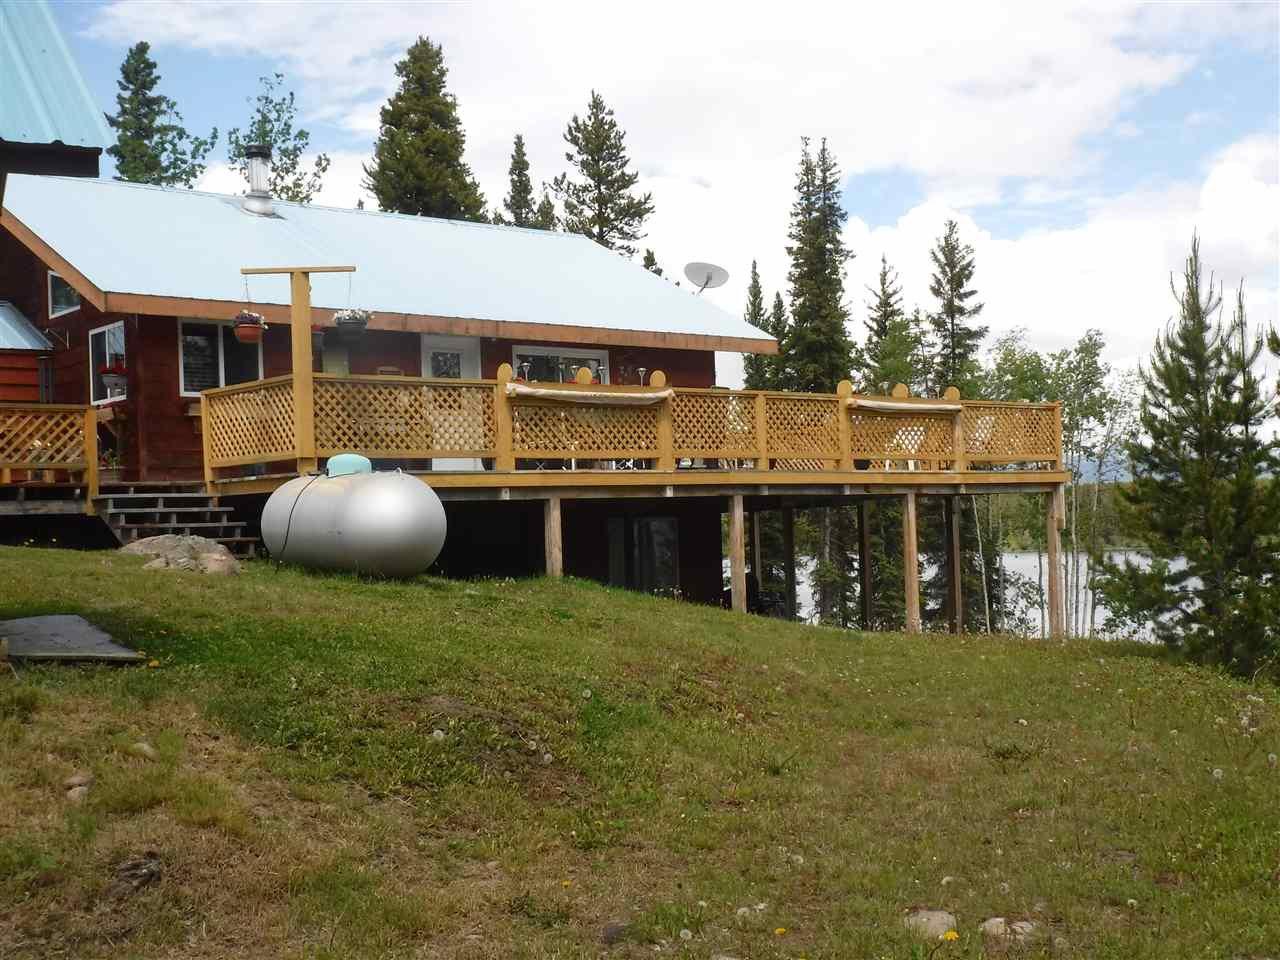 Photo 4: Photos: 3126 ELSEY Road in Williams Lake: Williams Lake - Rural West House for sale (Williams Lake (Zone 27))  : MLS®# R2467730